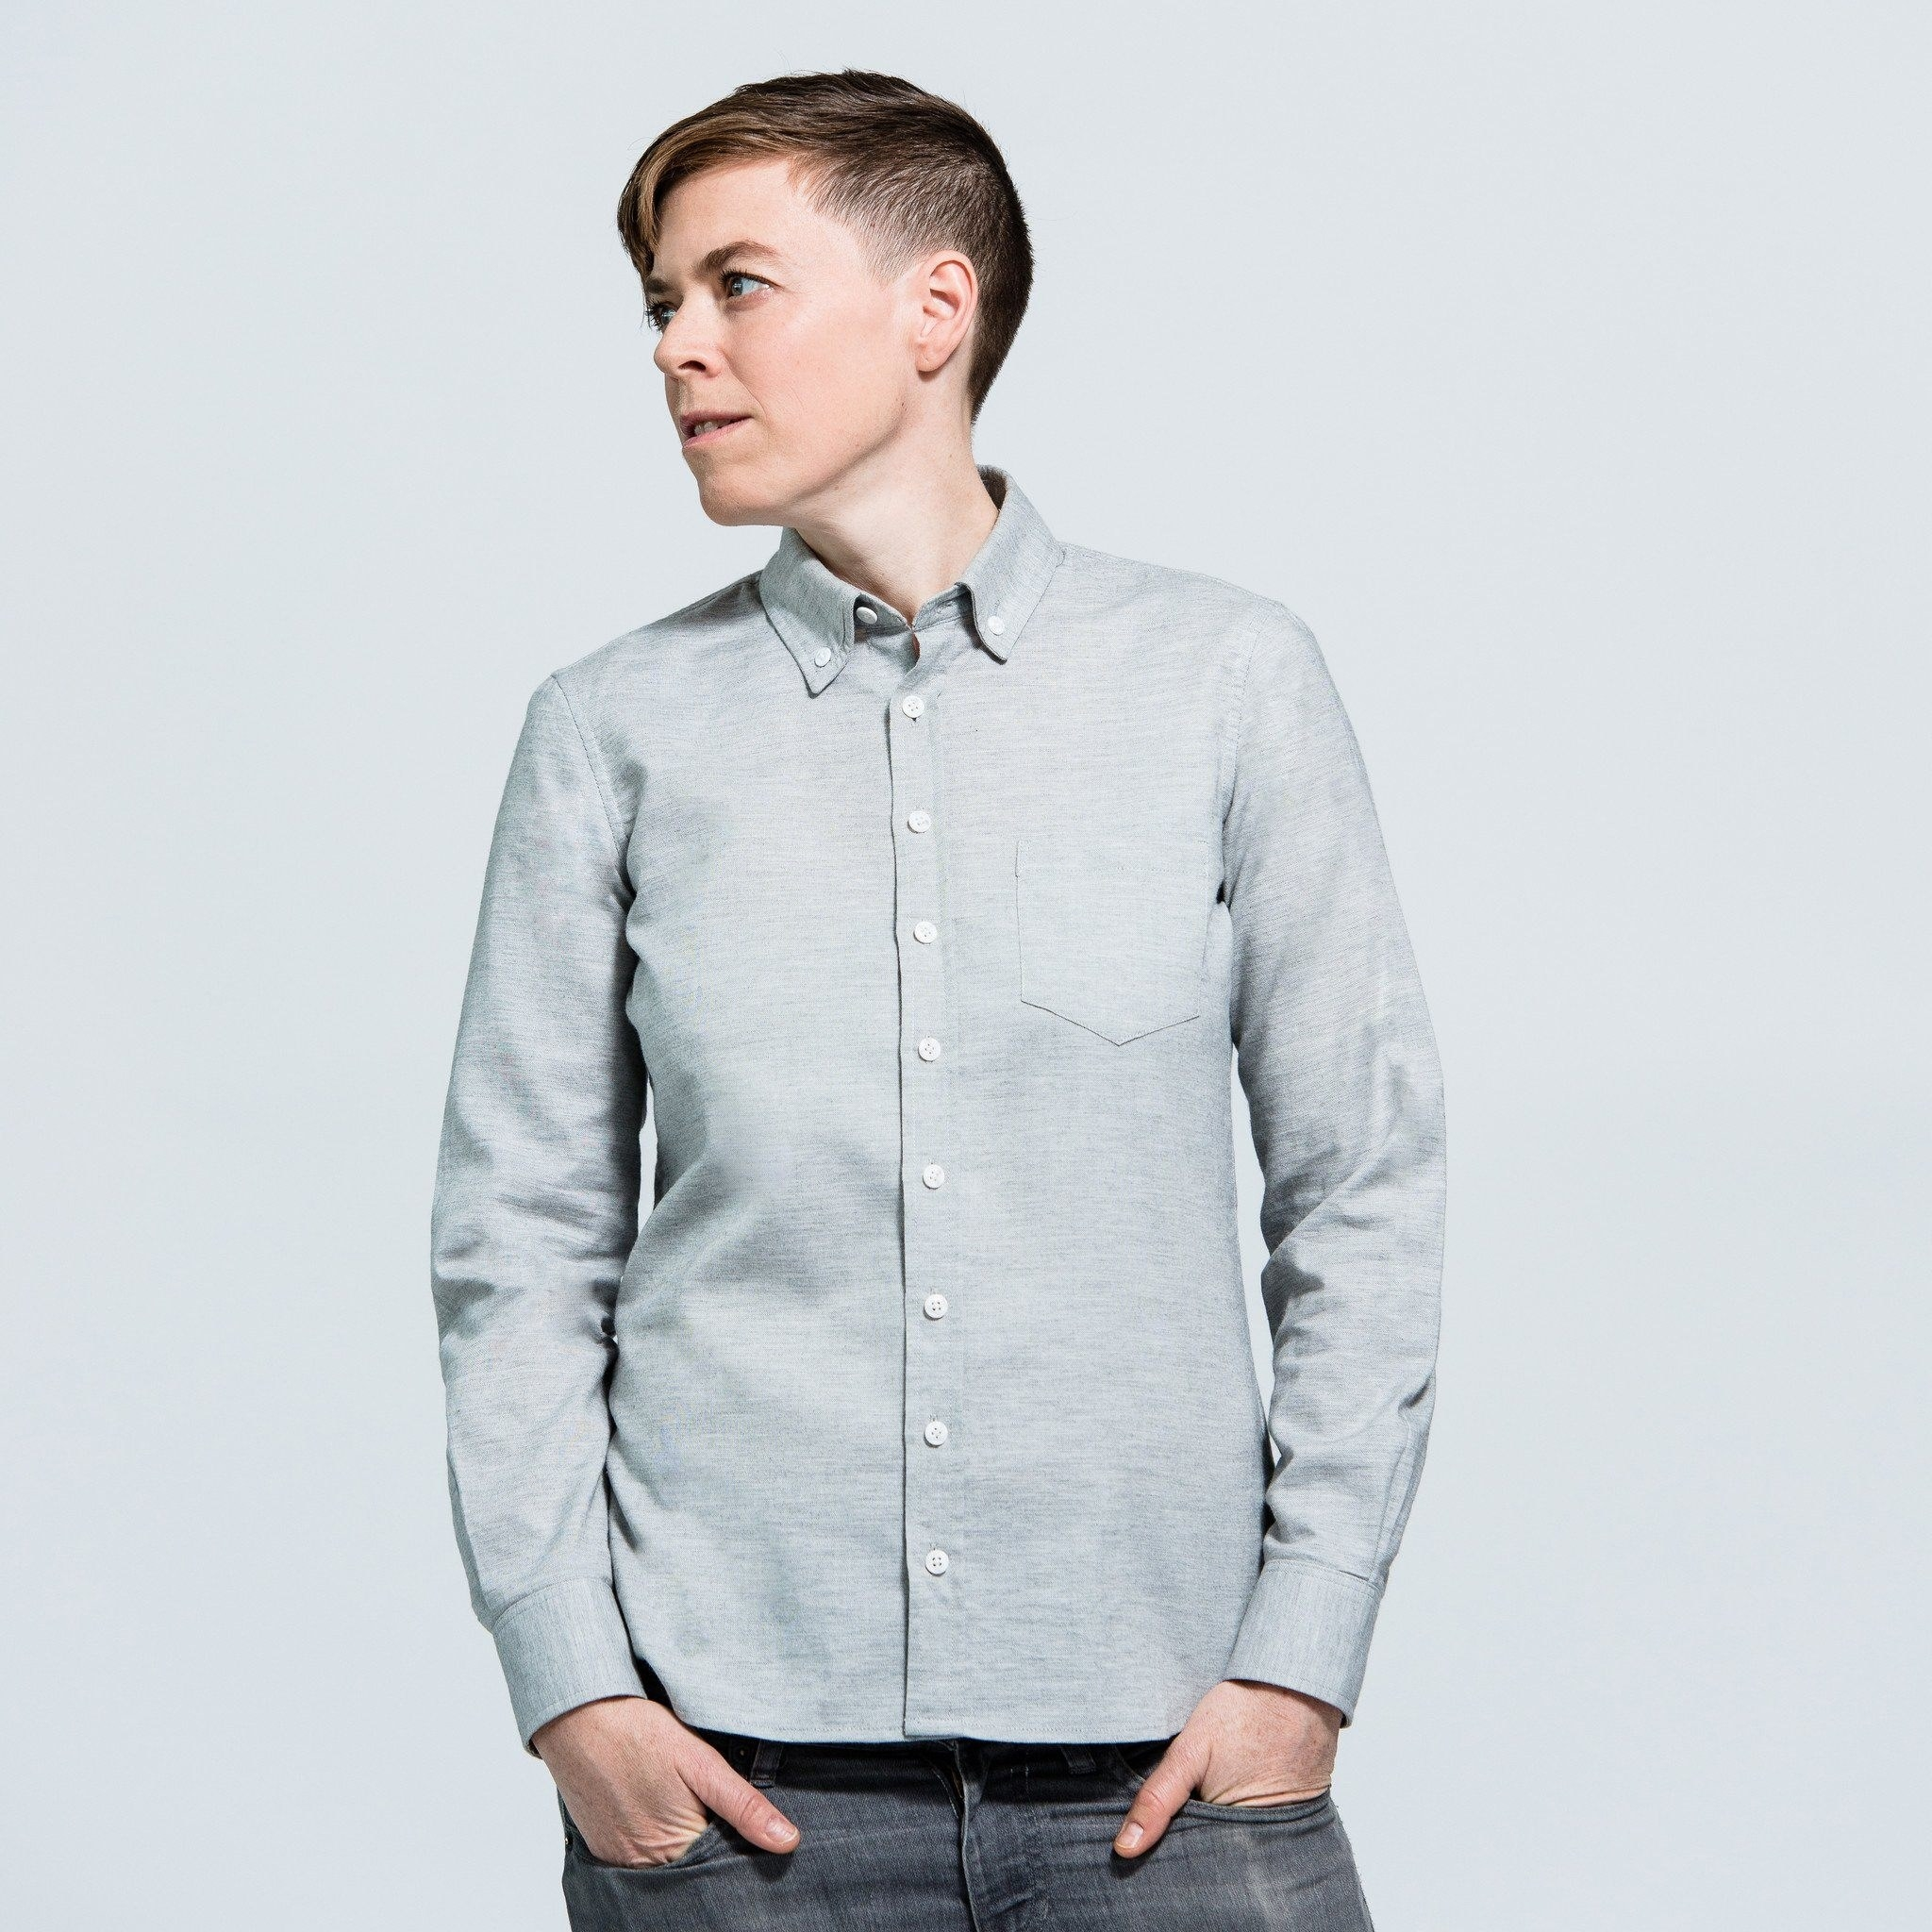 Kirrin Finch Stark Oxford shirt in gray colorway on model in studio